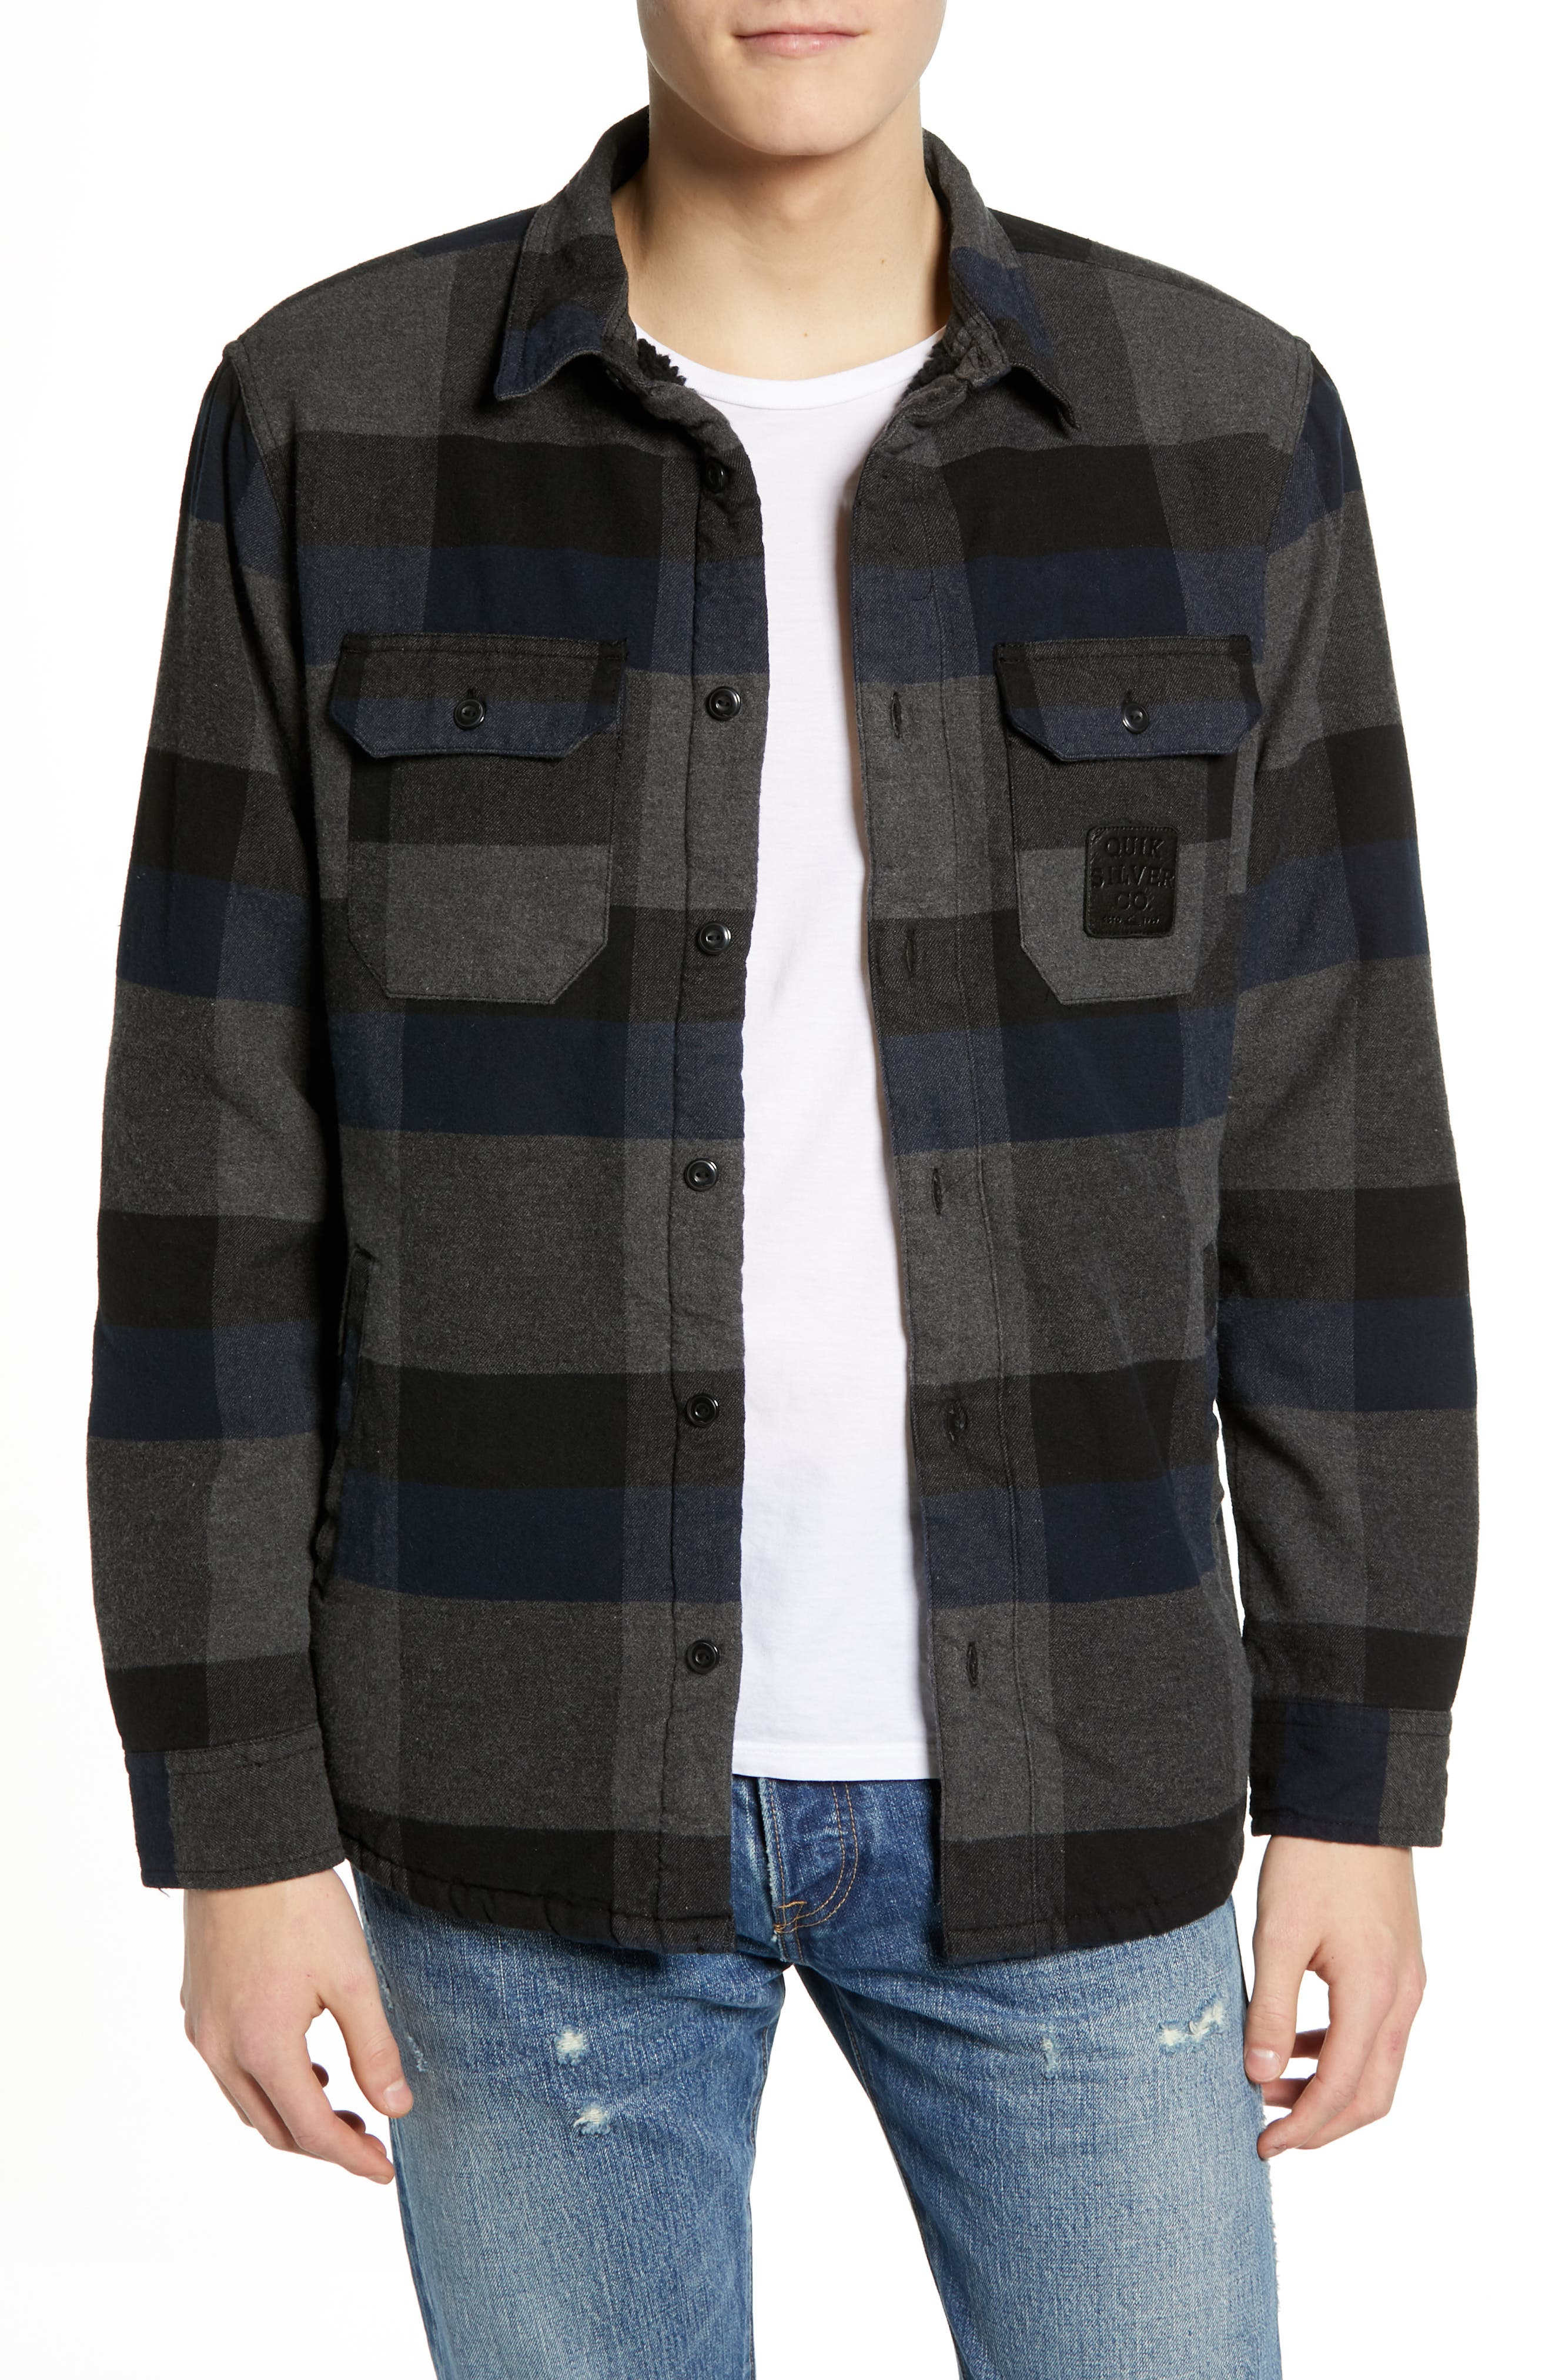 QUIKSILVER Miho Stones Long Sleeve Woven Shirt Jacket in Blue Night Sherpa